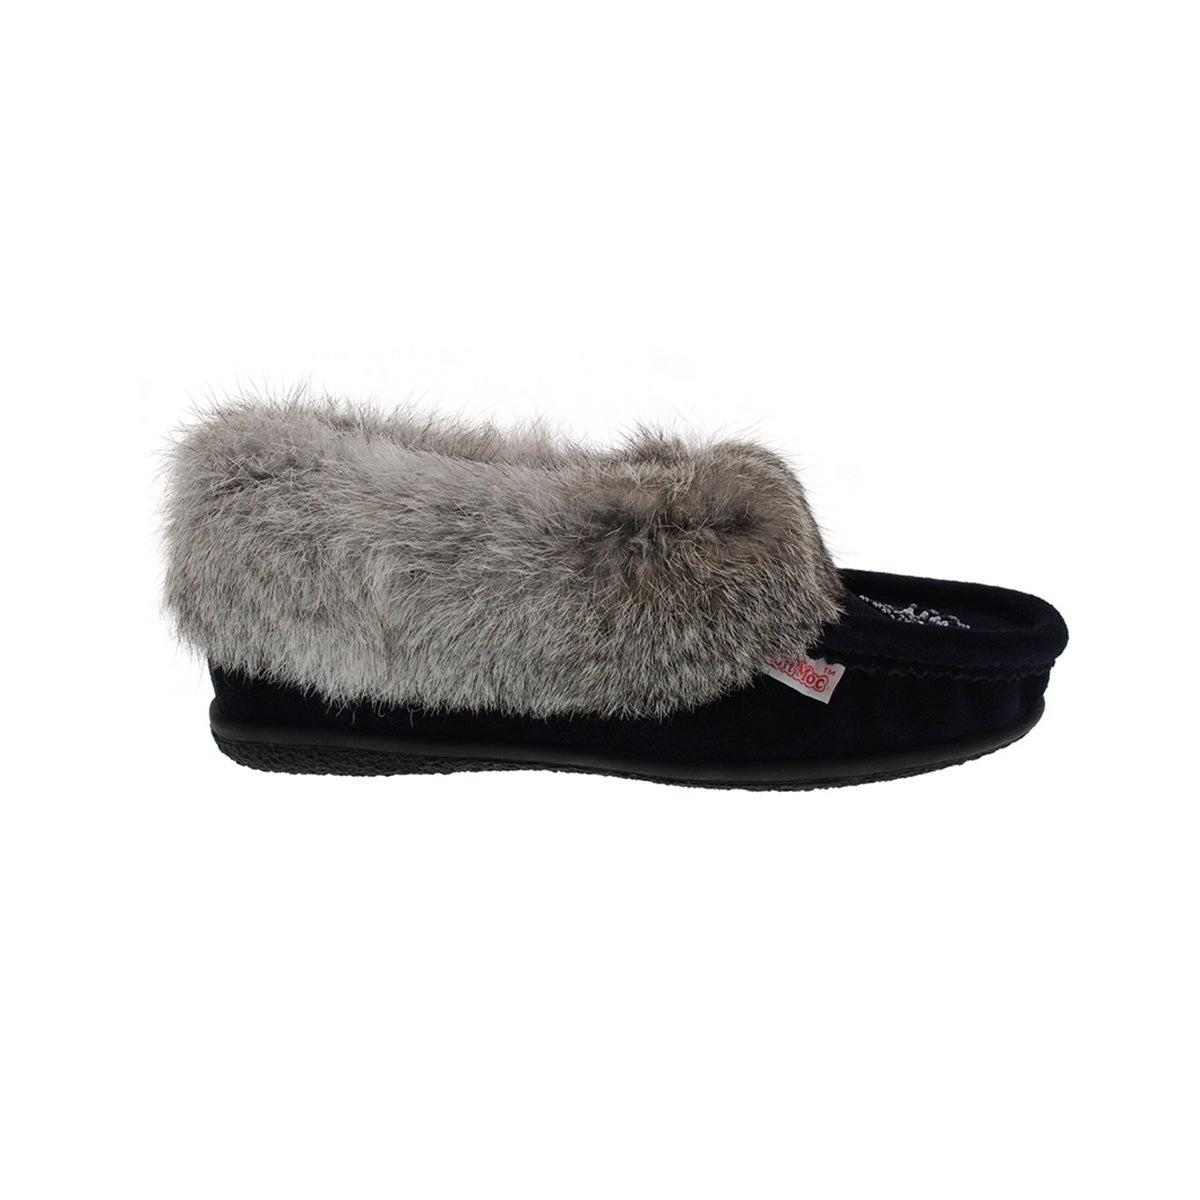 Lds Cute 3 navy rabbit fur moccasin